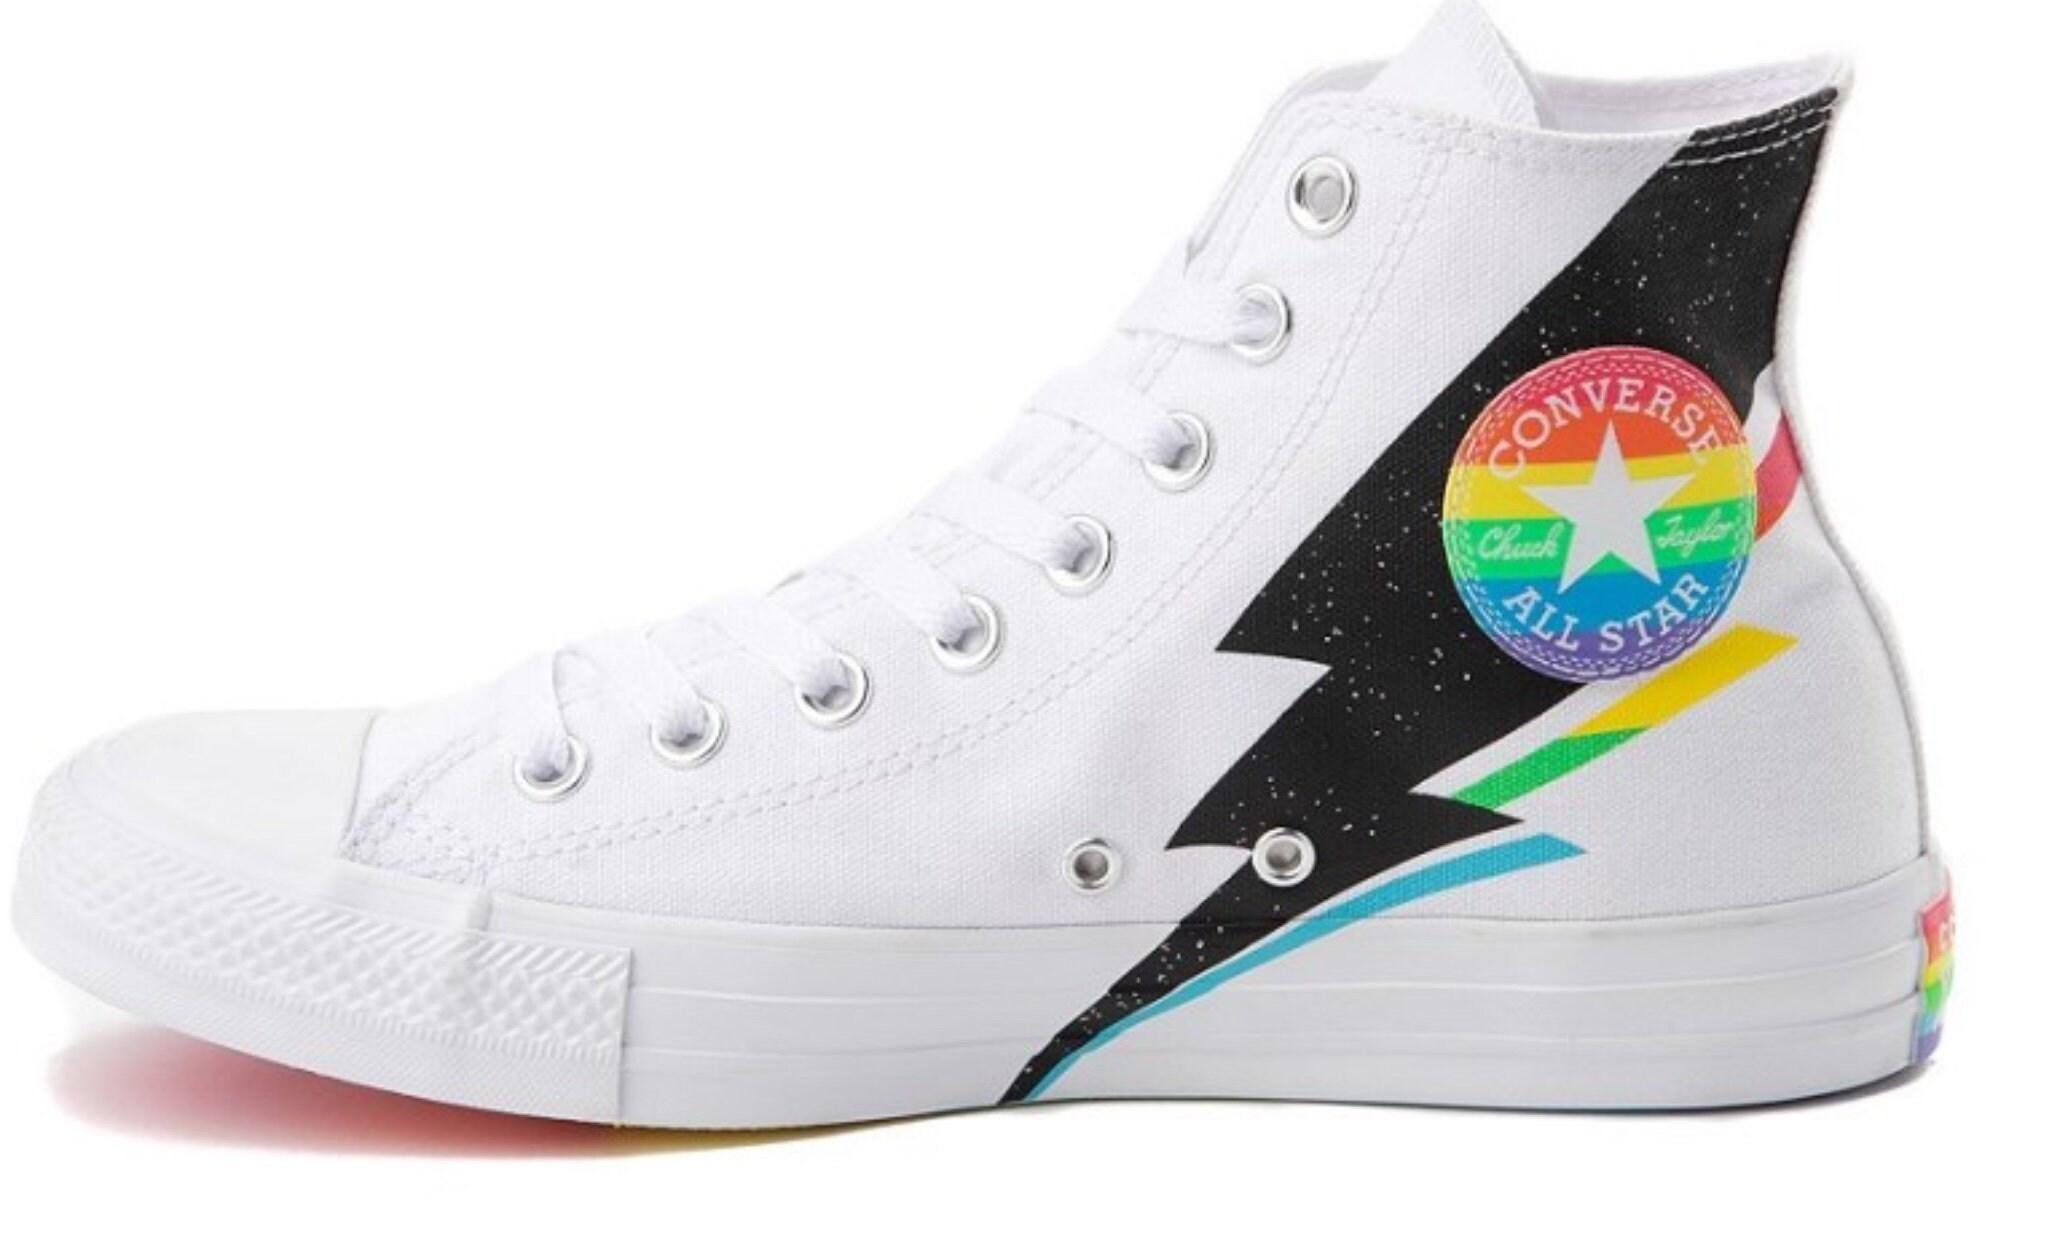 fae0f55696c91 Pride Converse LGBTQ 2019 Rainbow Multicolor White High Top Glitter  Lightning Bolt Chuck Taylor w/ Swarovski Crystal All Star Sneakers Shoes